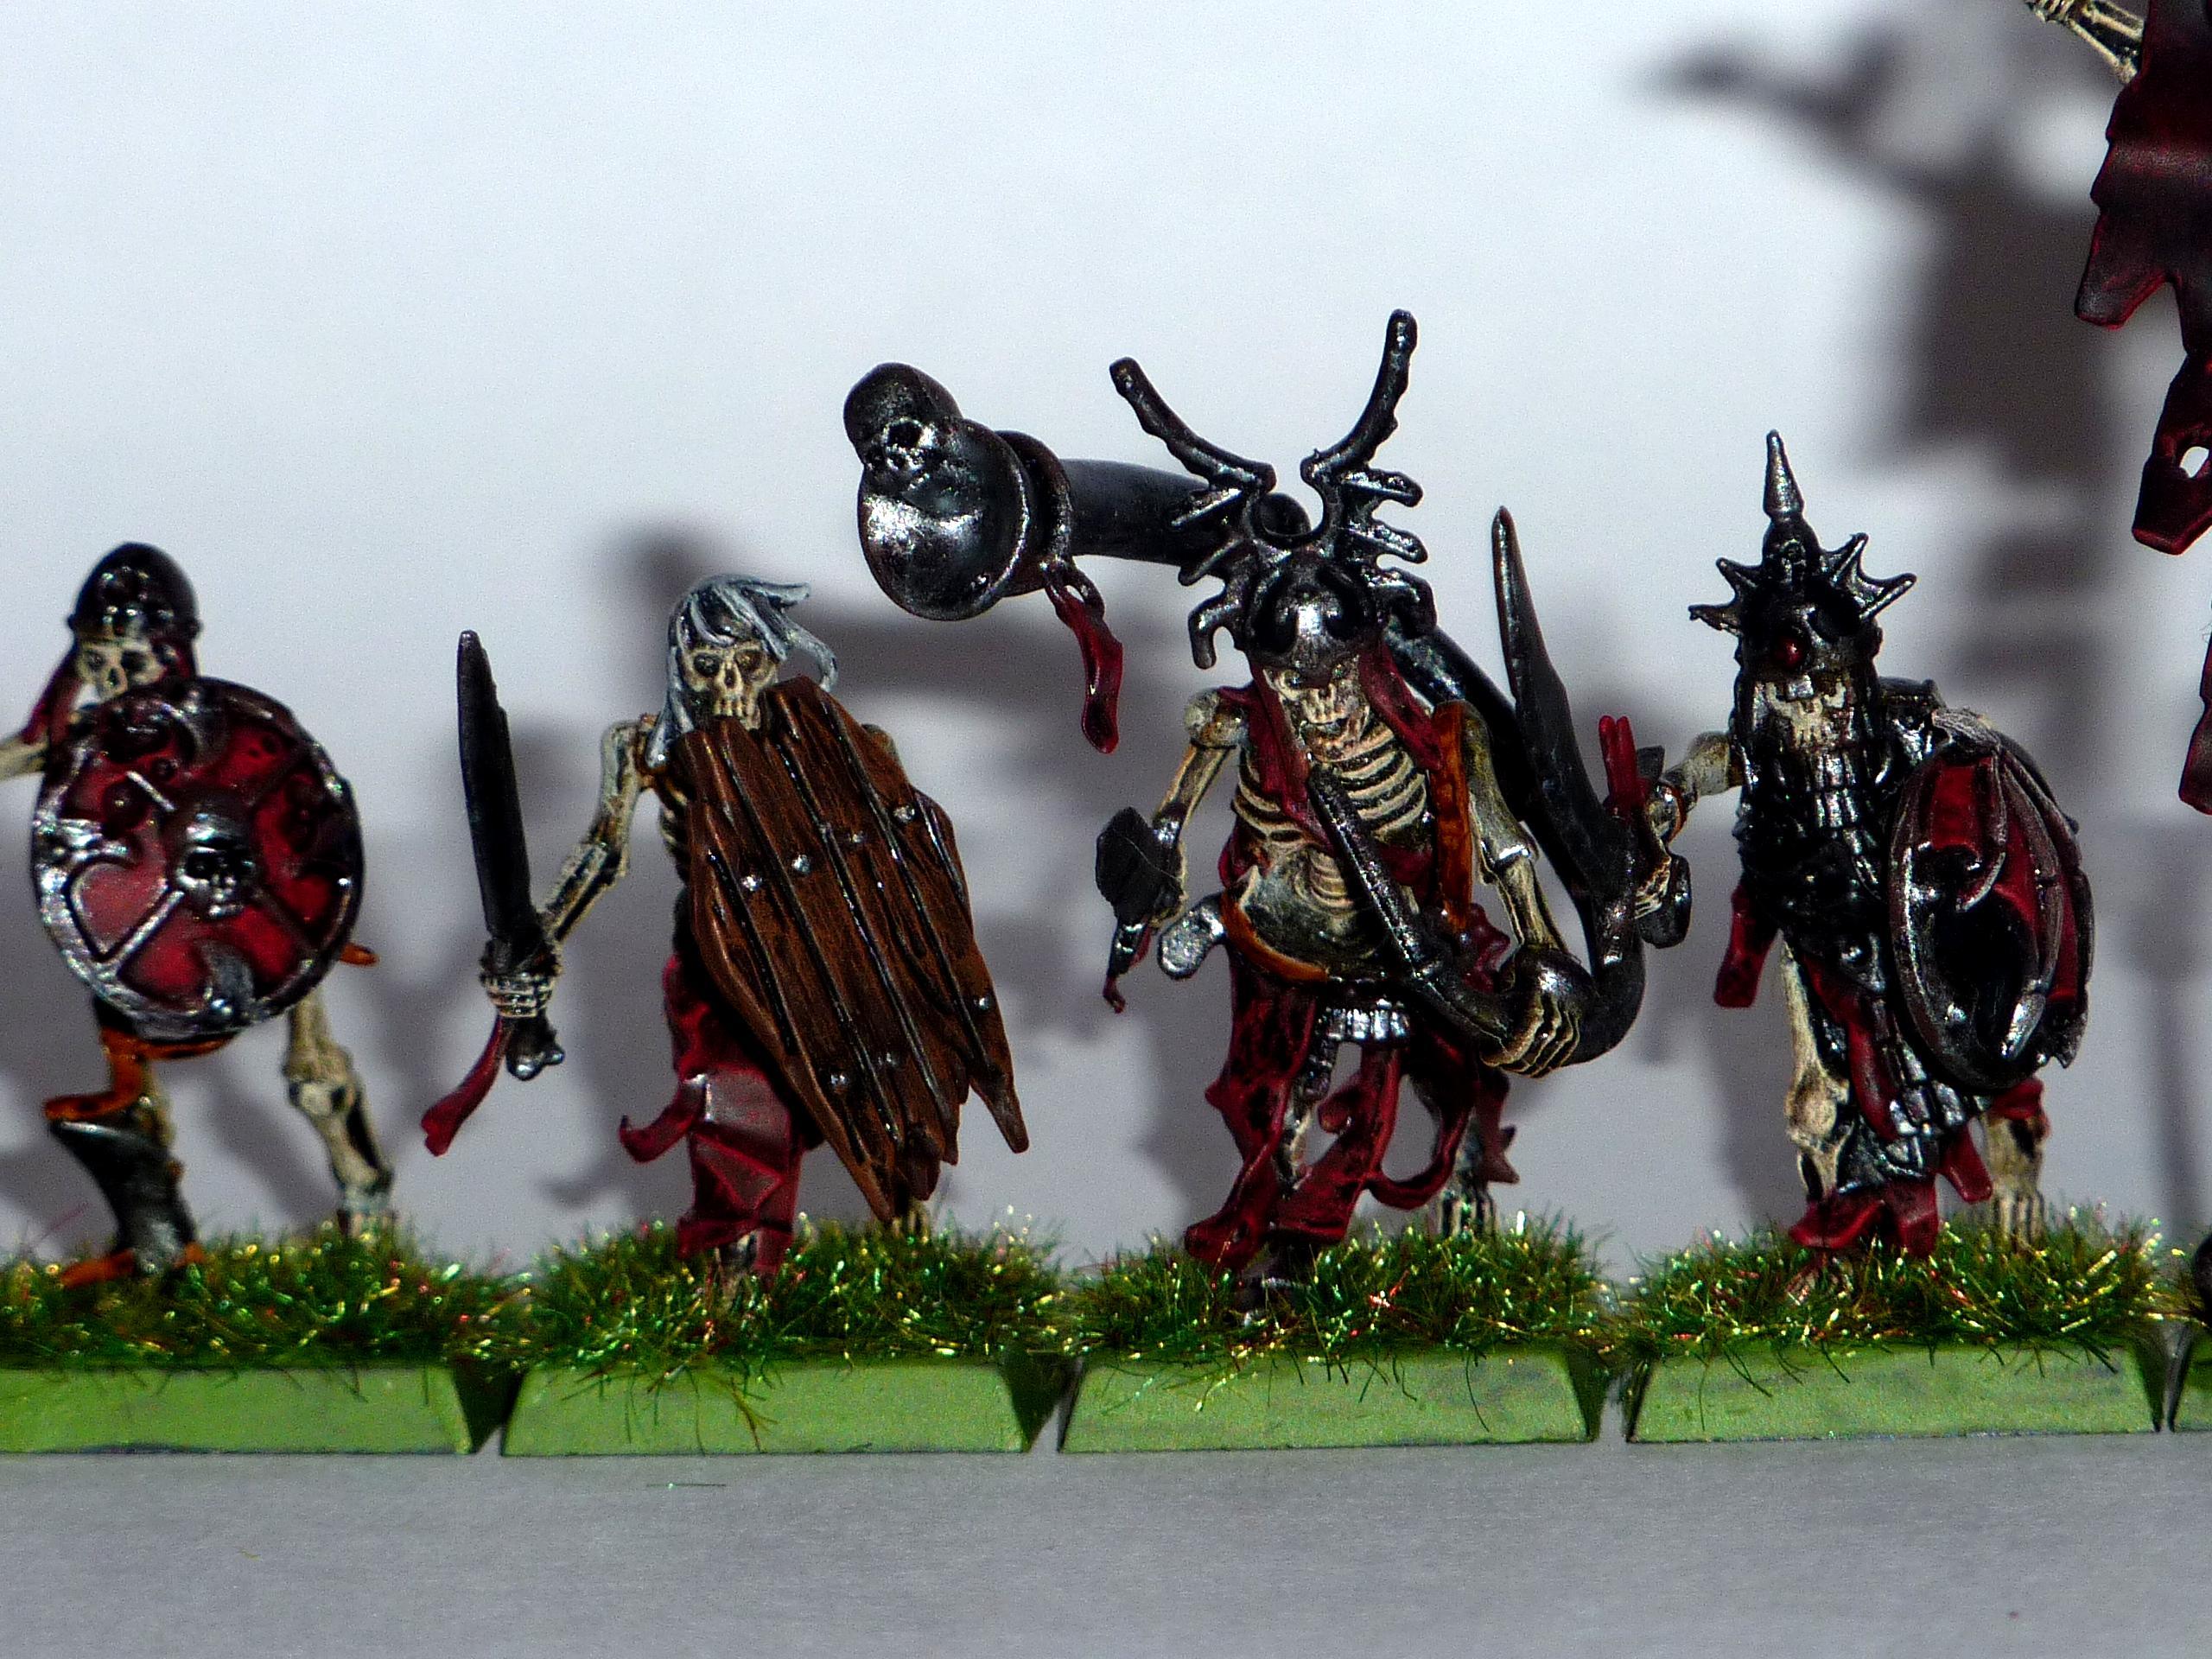 Skeletons, Vampire Counts, Warhammer Fantasy